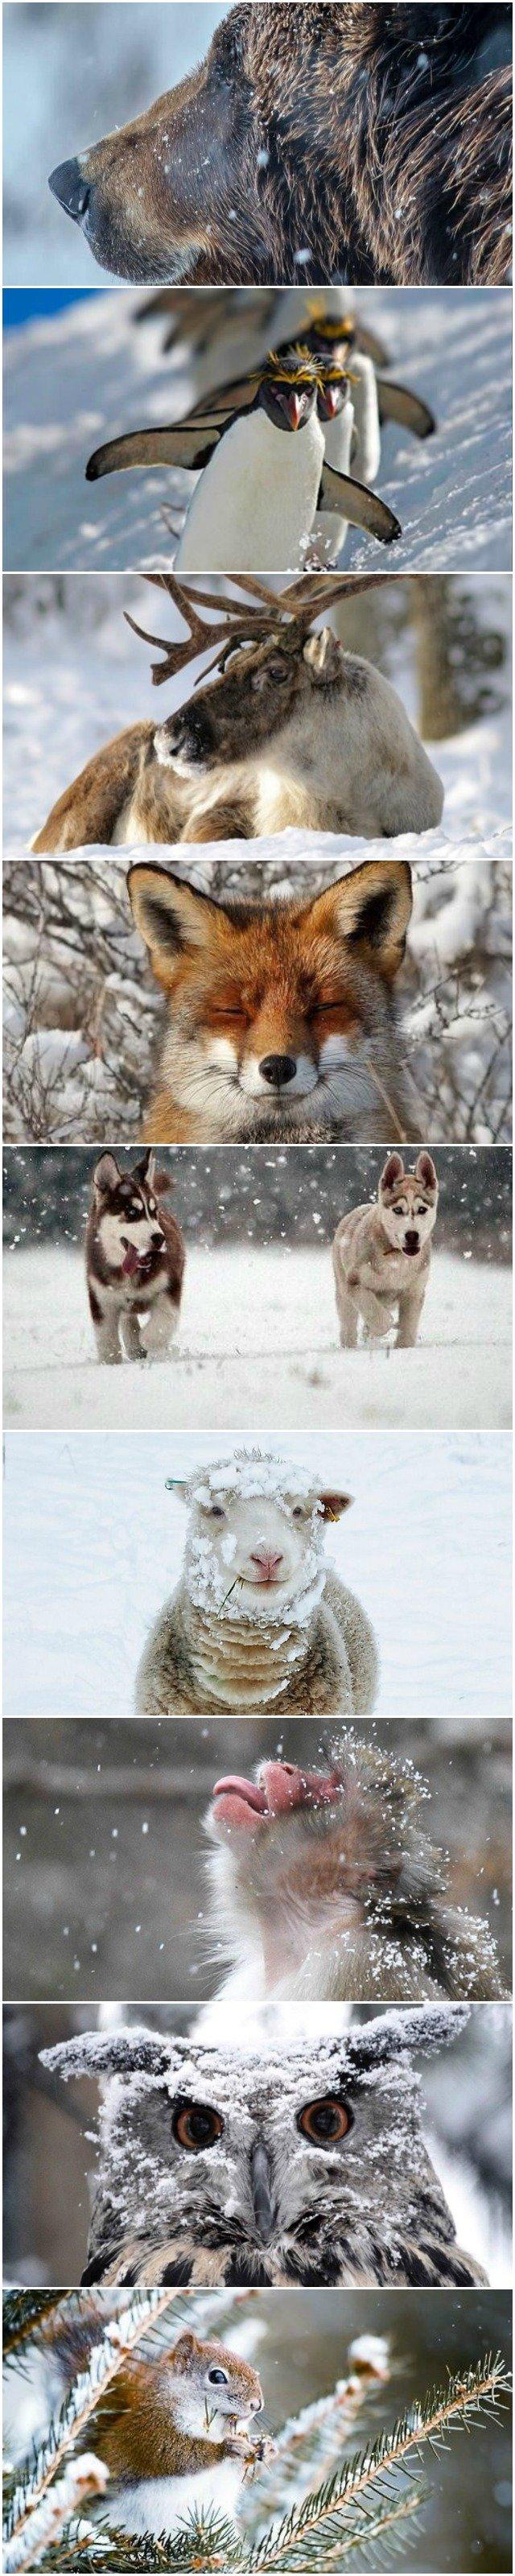 animals-enjoying-the-snow